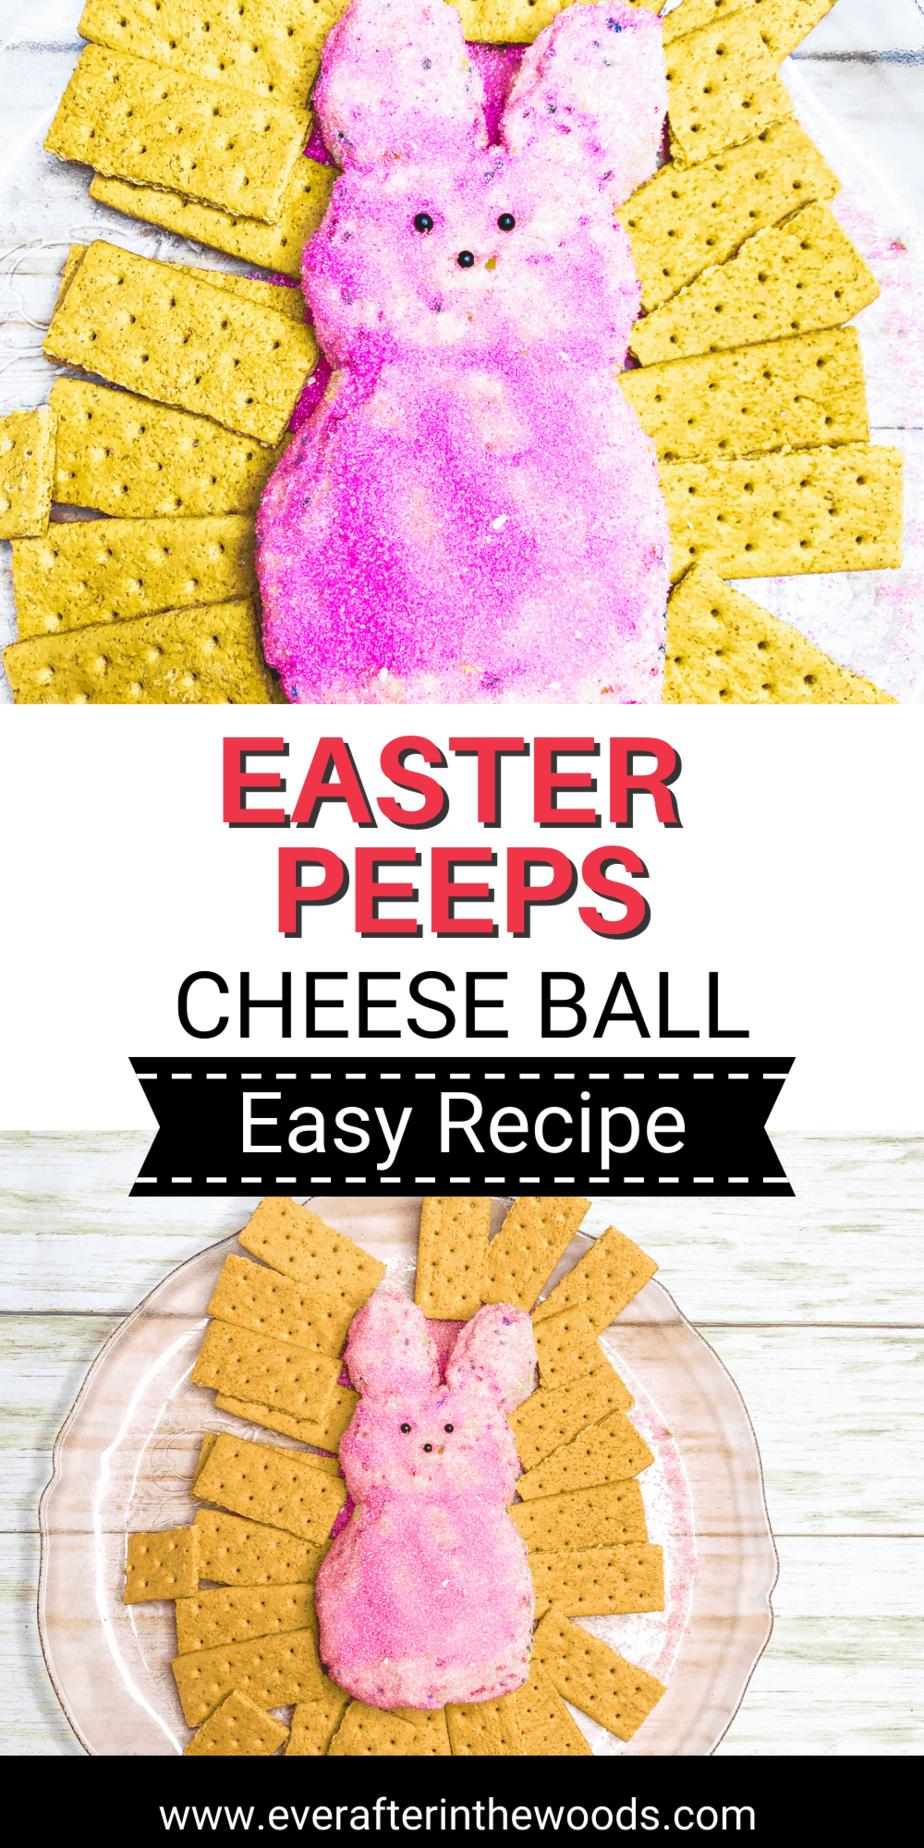 Easter Peeps Cheese Ball Dessert